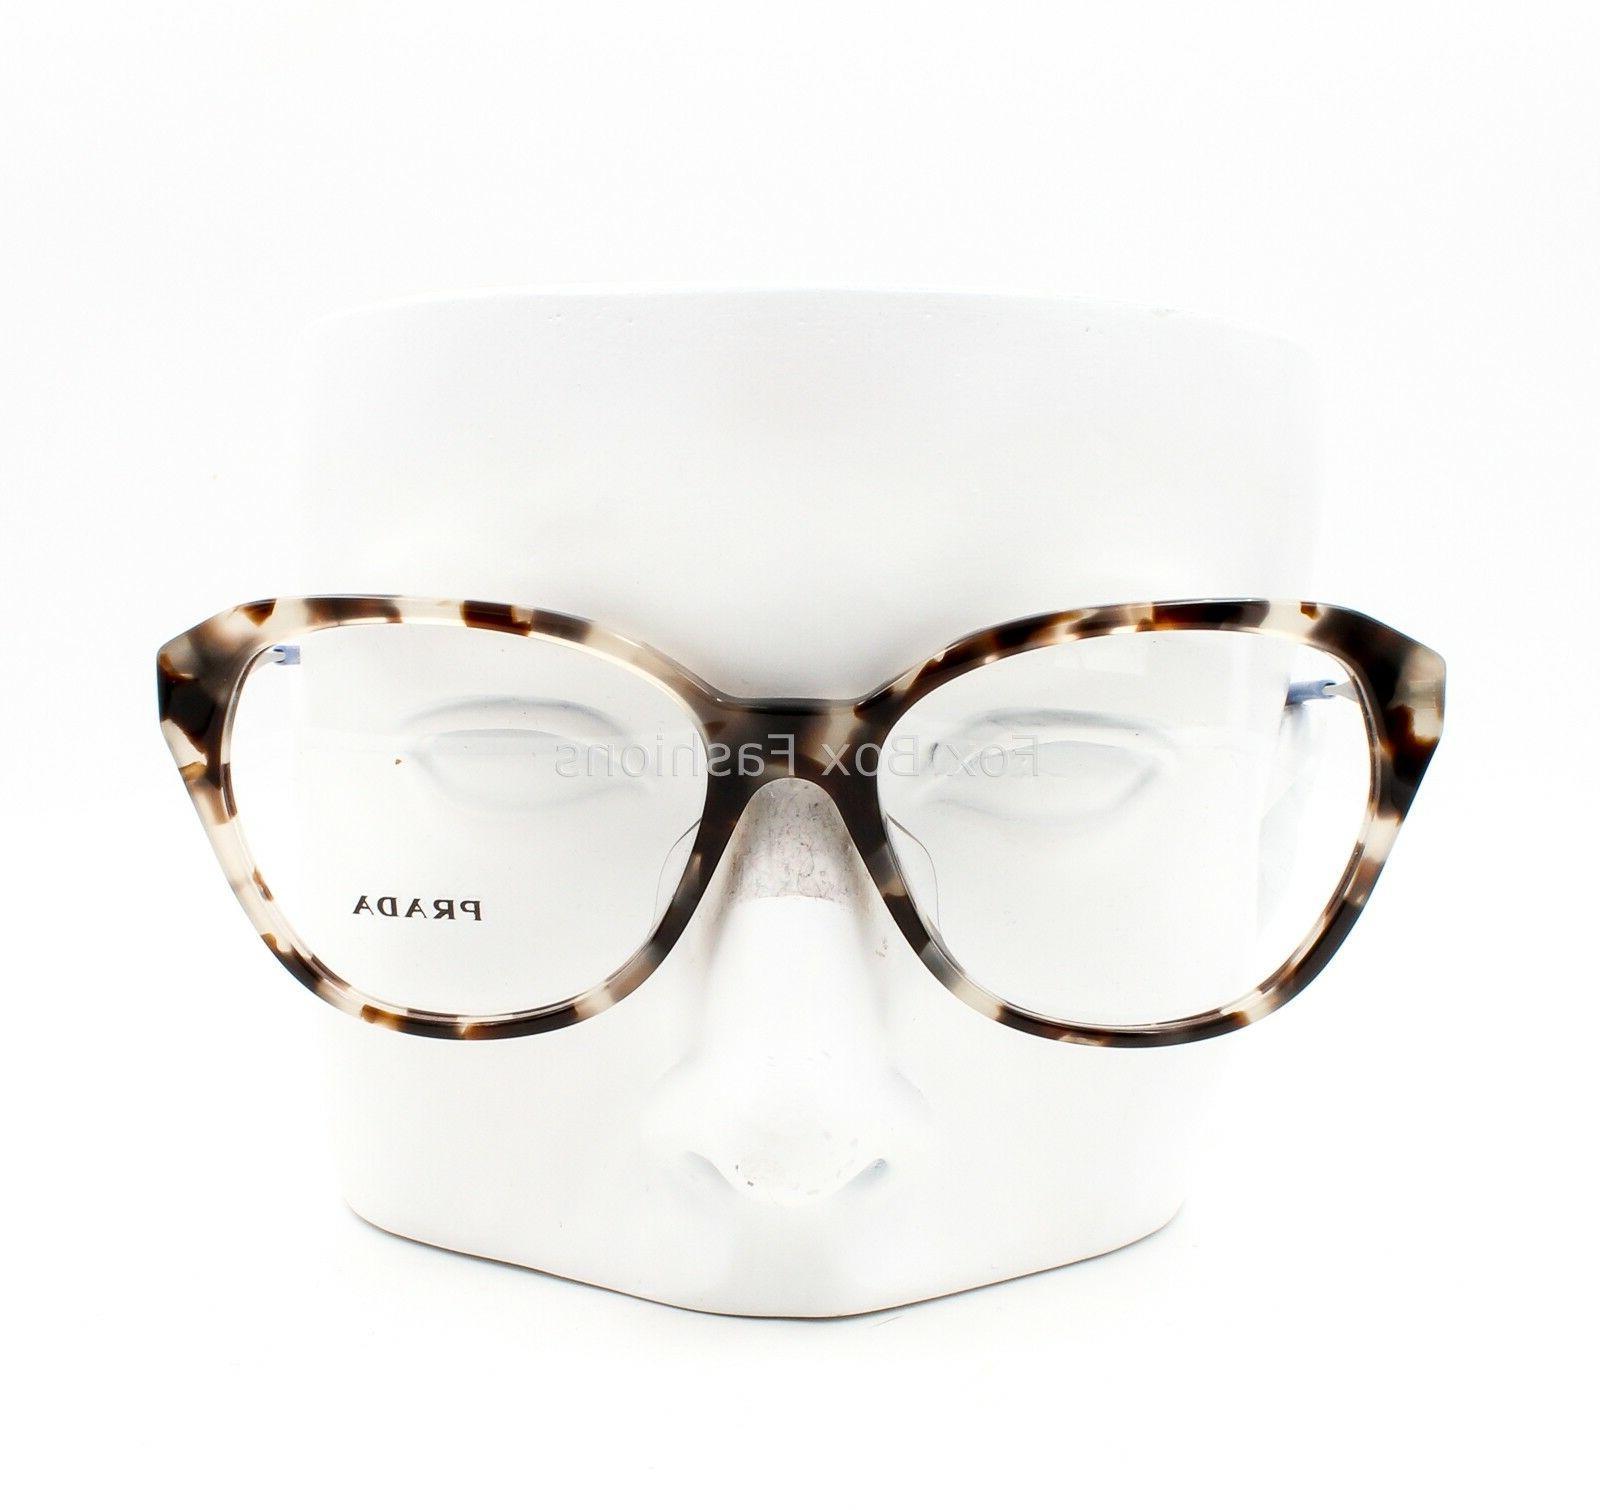 Prada VPR 28S-F Eyeglasses Glasses Opal Havana Fit